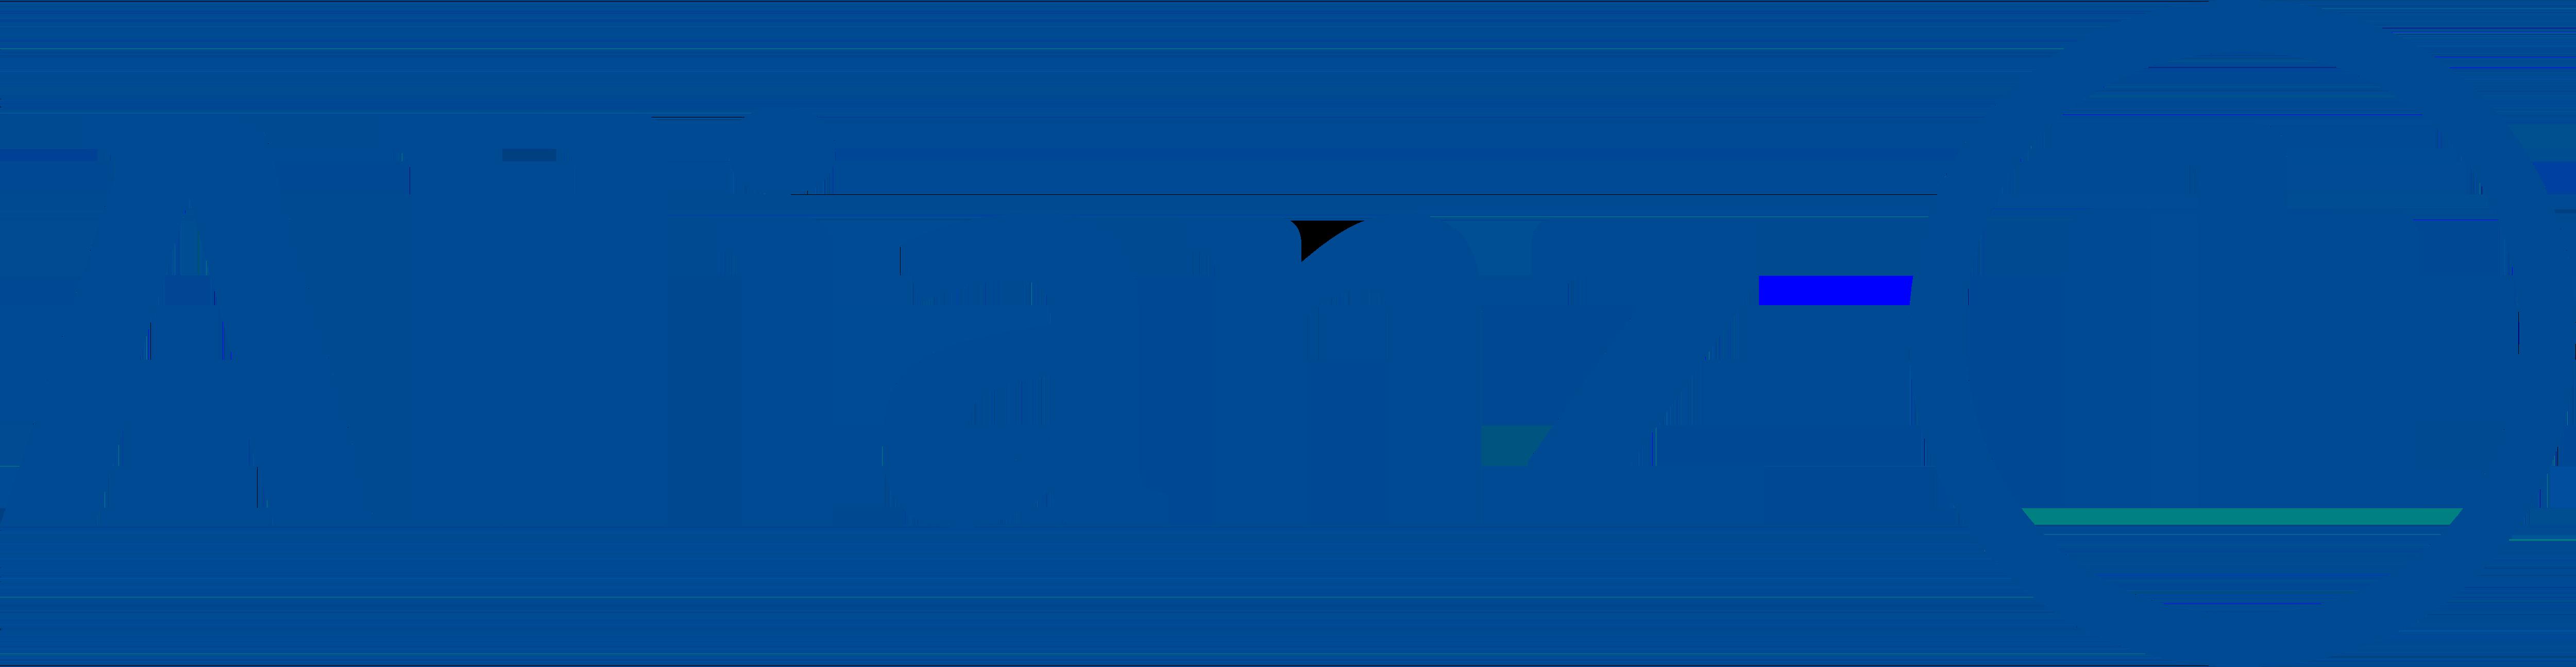 Allianz_